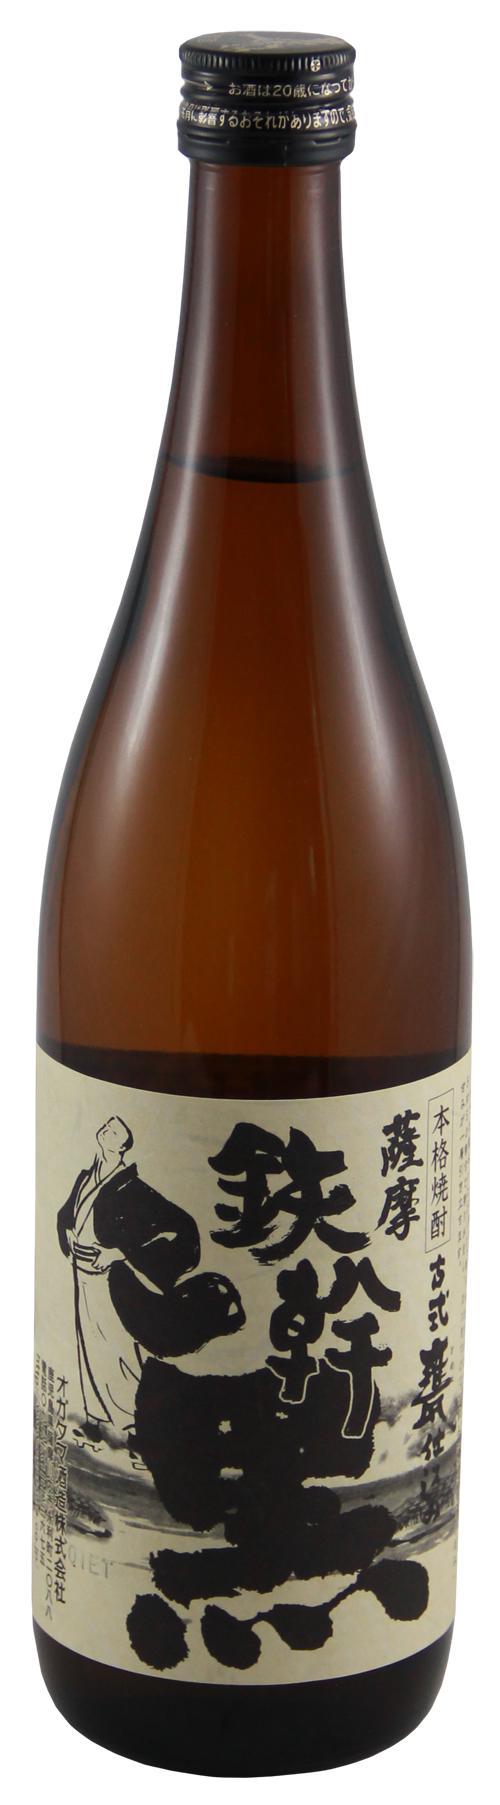 Ogatama Tekkan Kuro Shochu